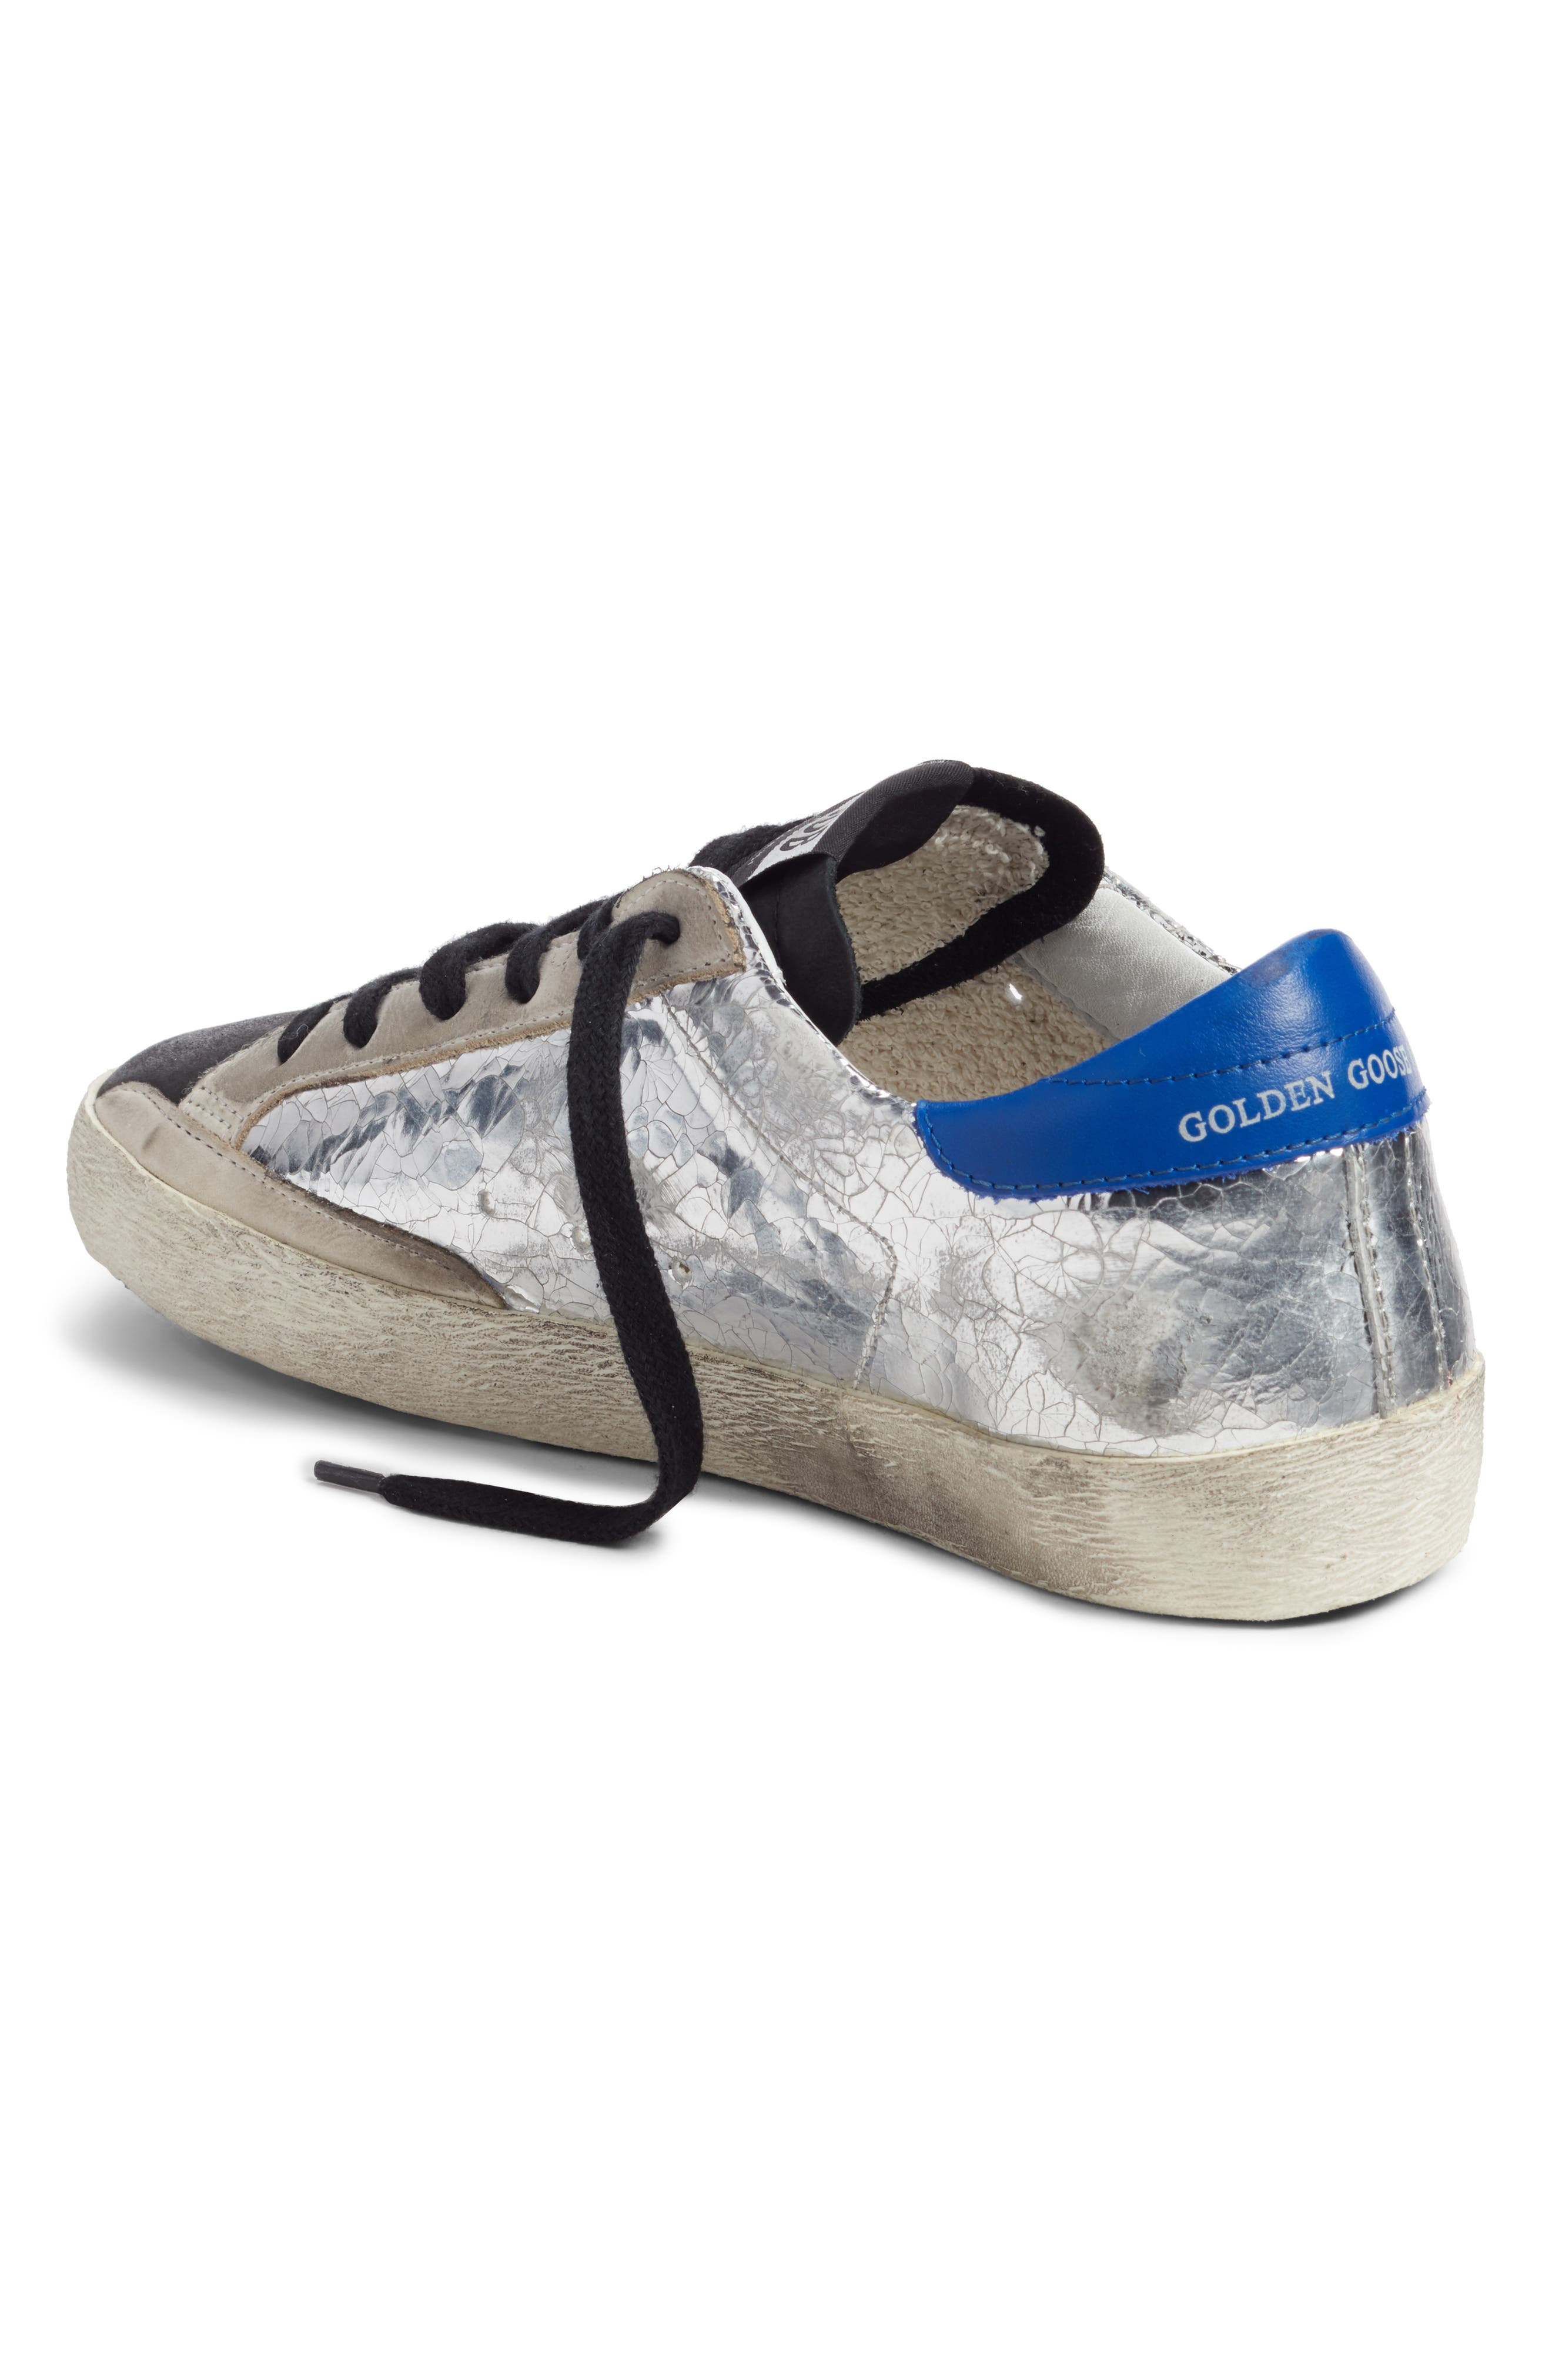 GOLDEN GOOSE,                             Superstar Sneaker,                             Alternate thumbnail 2, color,                             SILVER/ BLUE